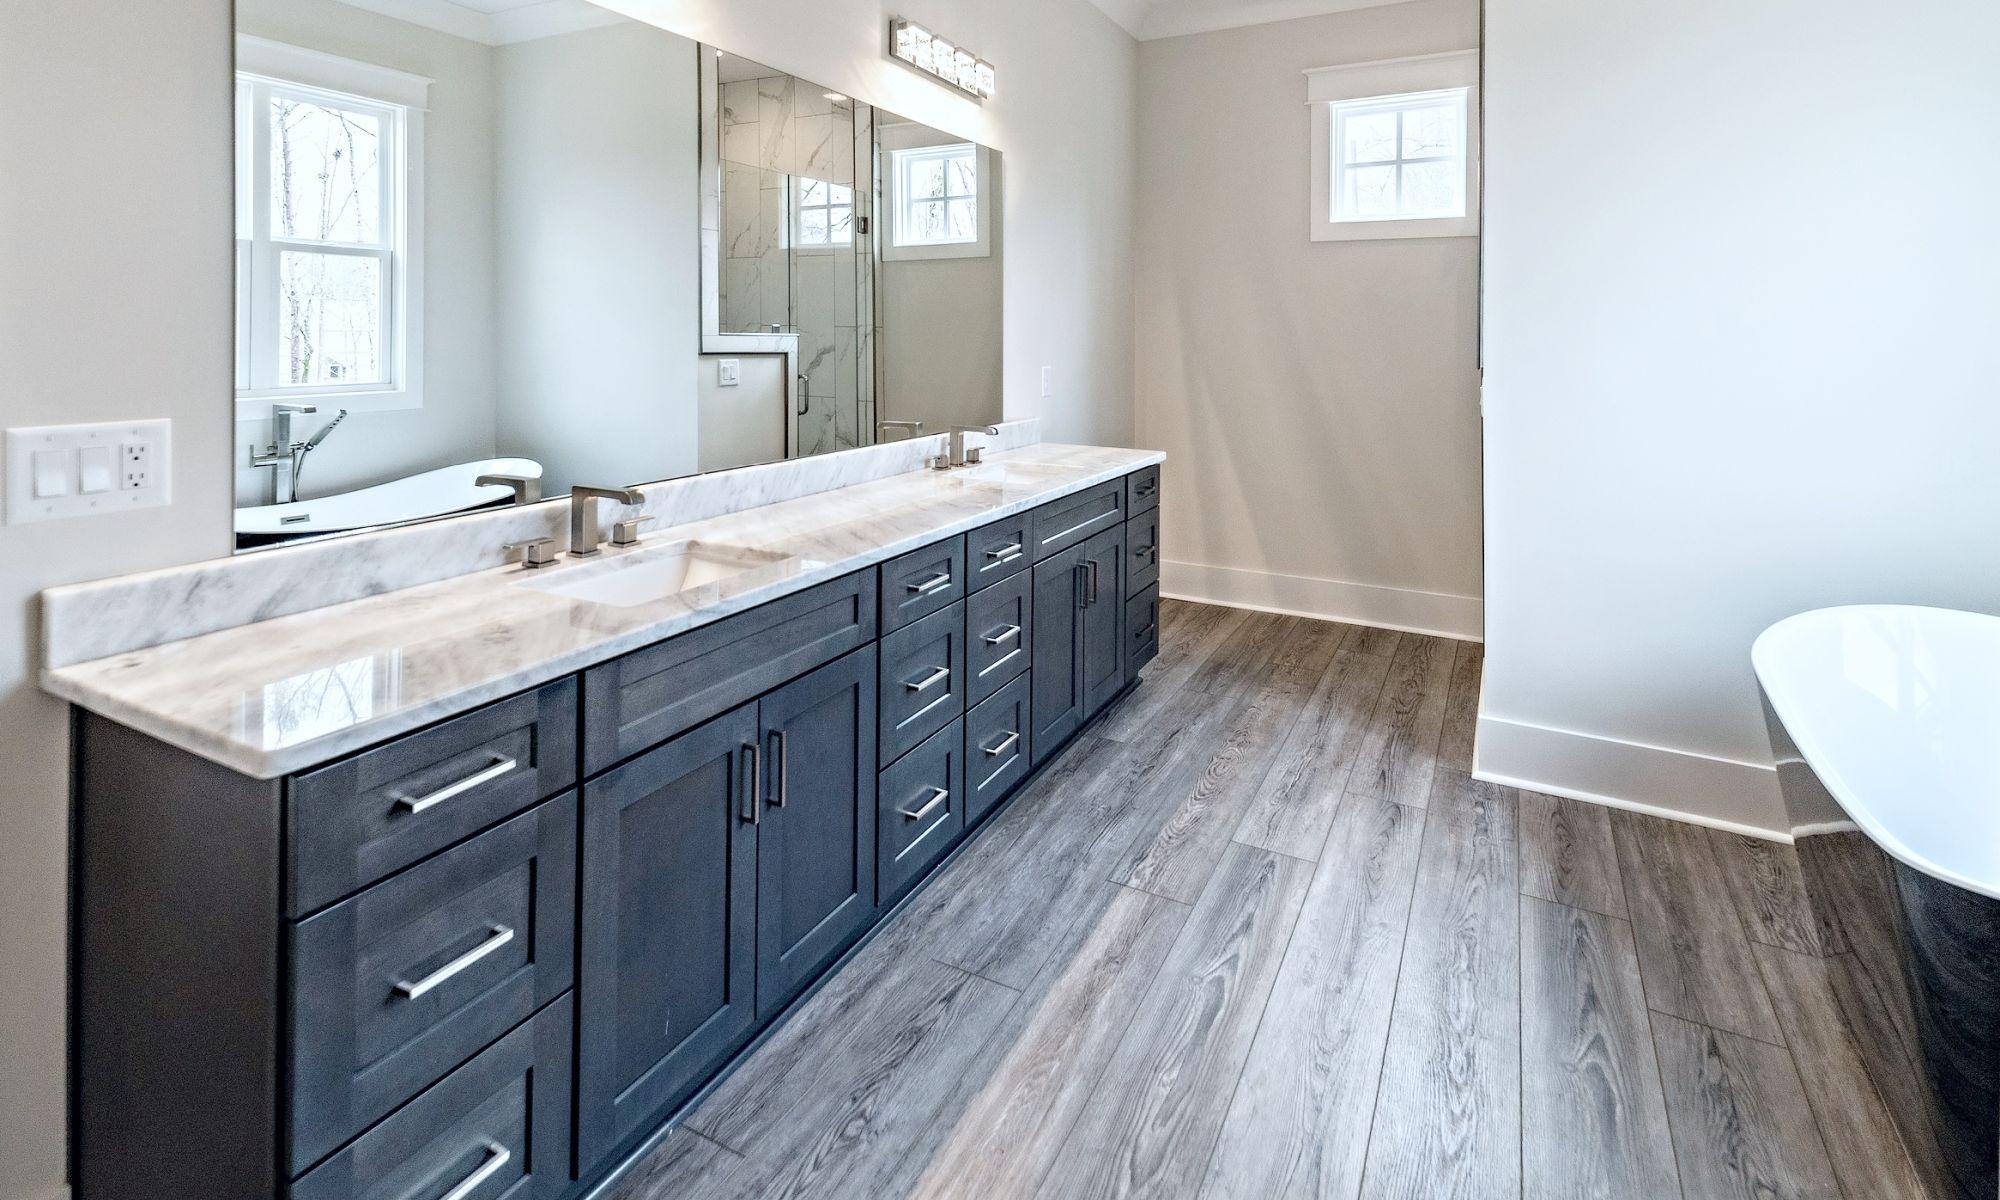 01 J. Snider Bathroom (1) - New Single Family Home Custom Construction North West Georgia